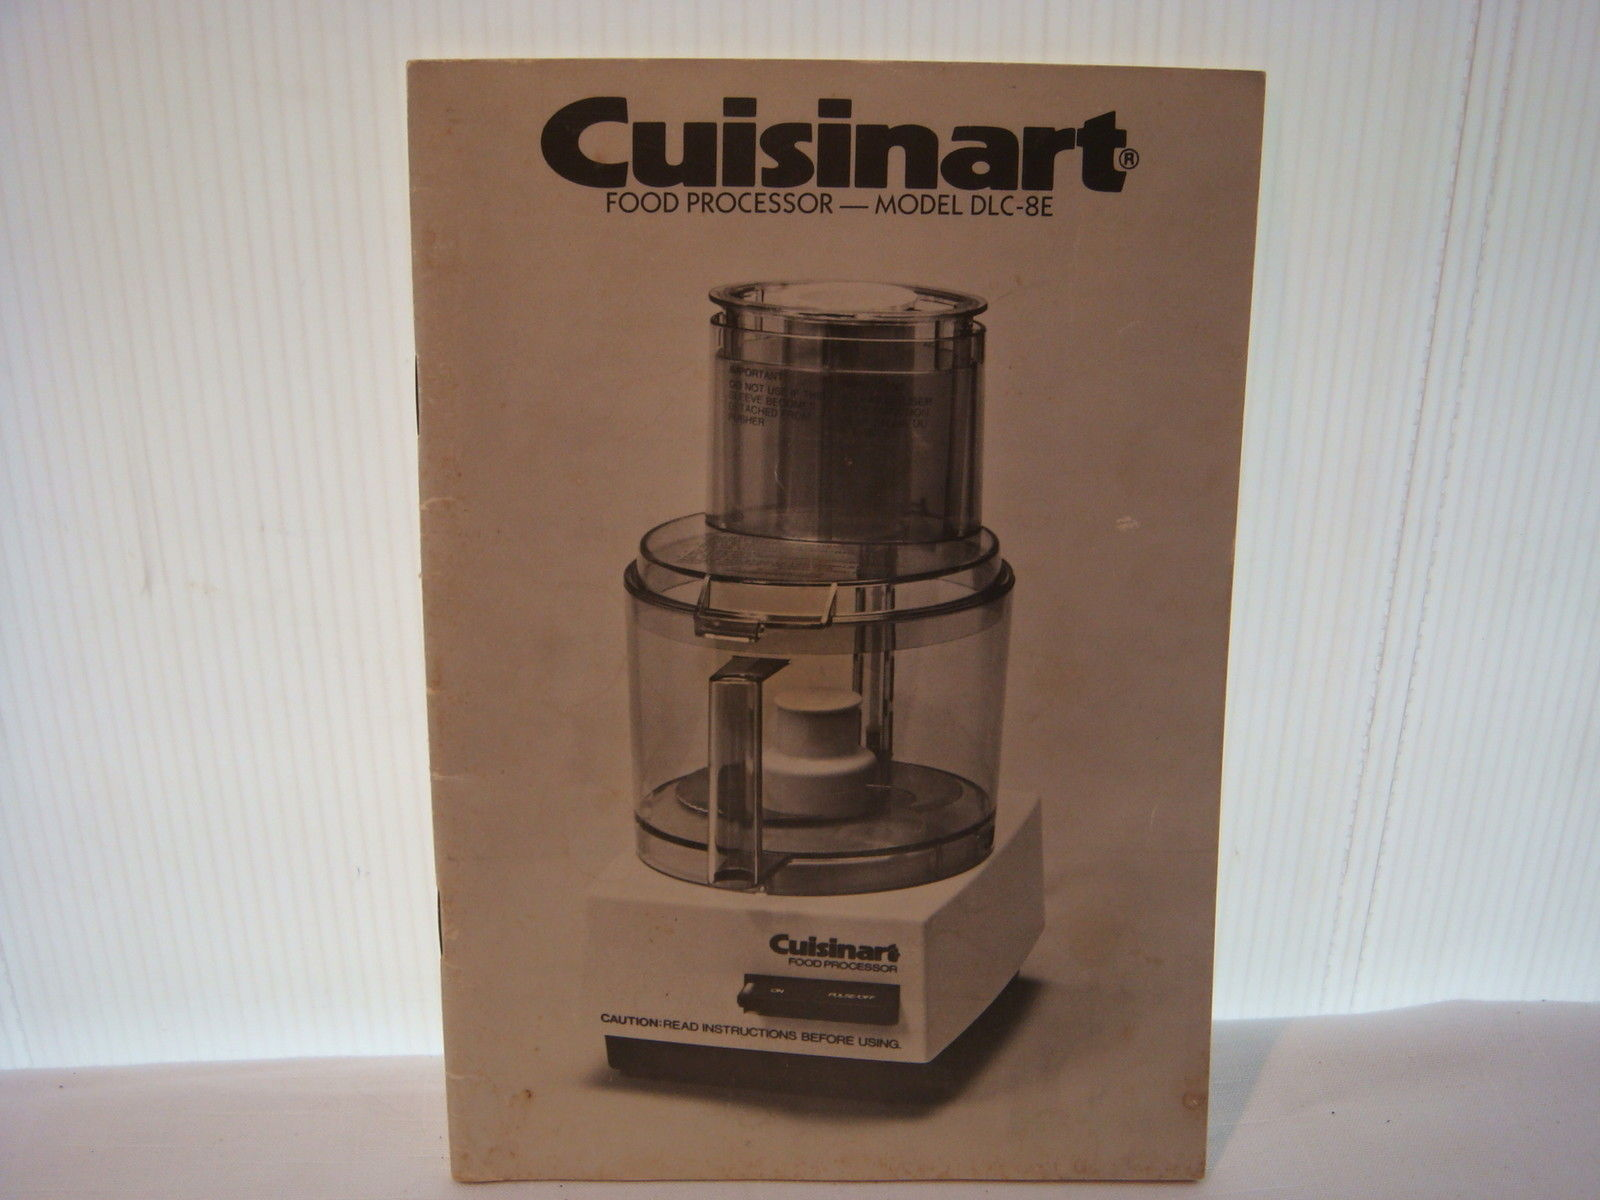 Cuisinart Food Processor Instruction Manual